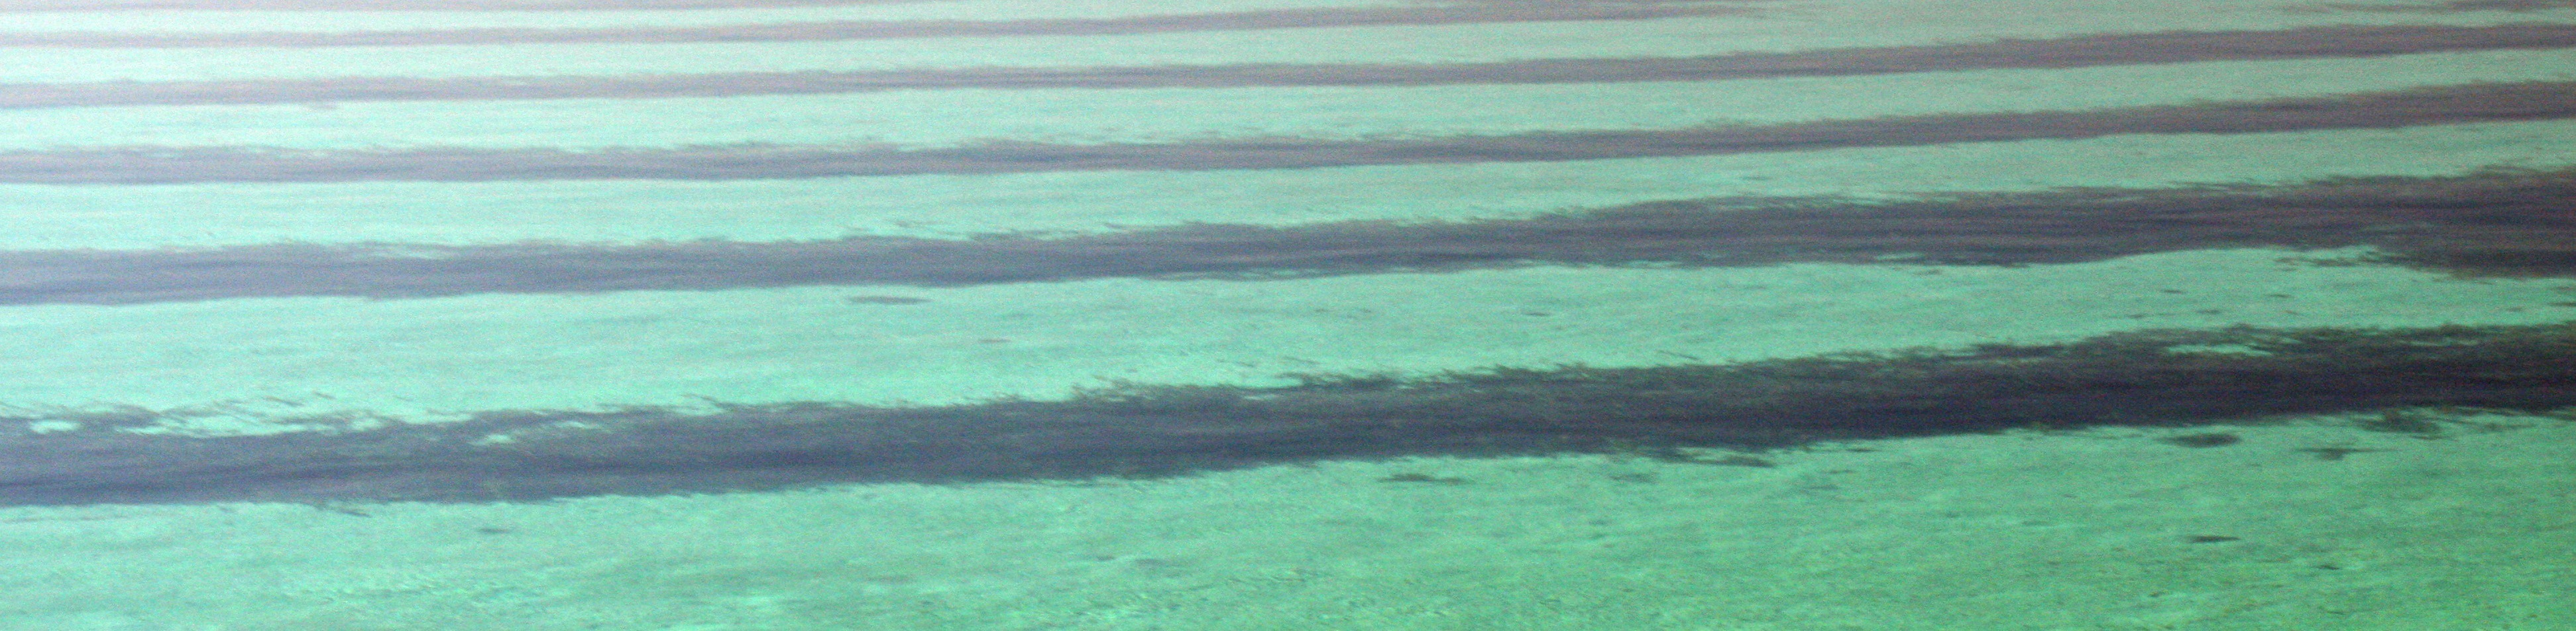 Shark Bay Australia Seagrass Shark Bay Australia